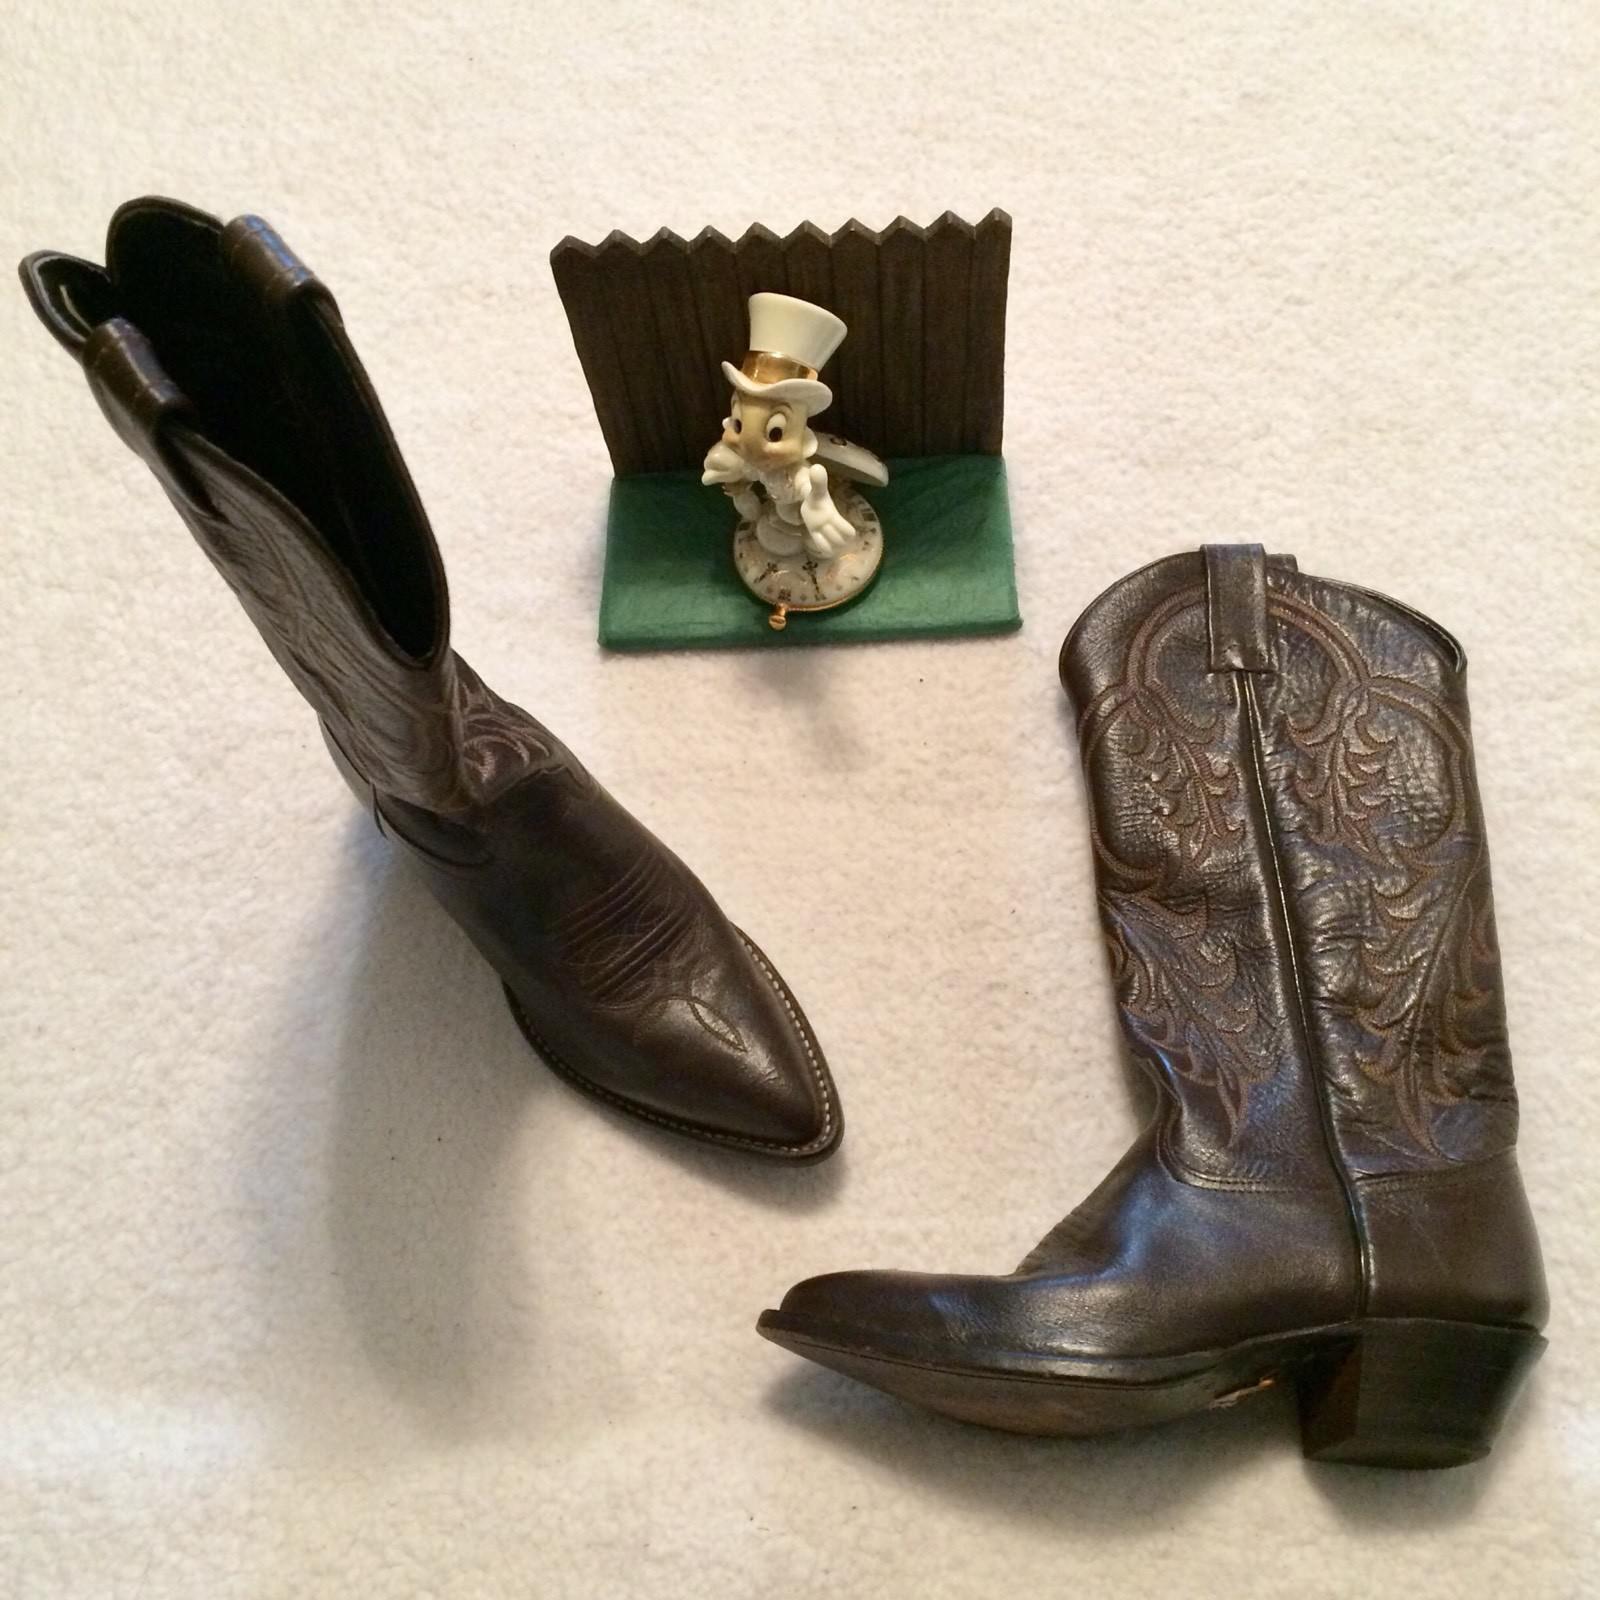 Tony Lama Damenschuhe Cowboy Stiefel Größe 5 M Braun.. Very Nice 08615011 1995